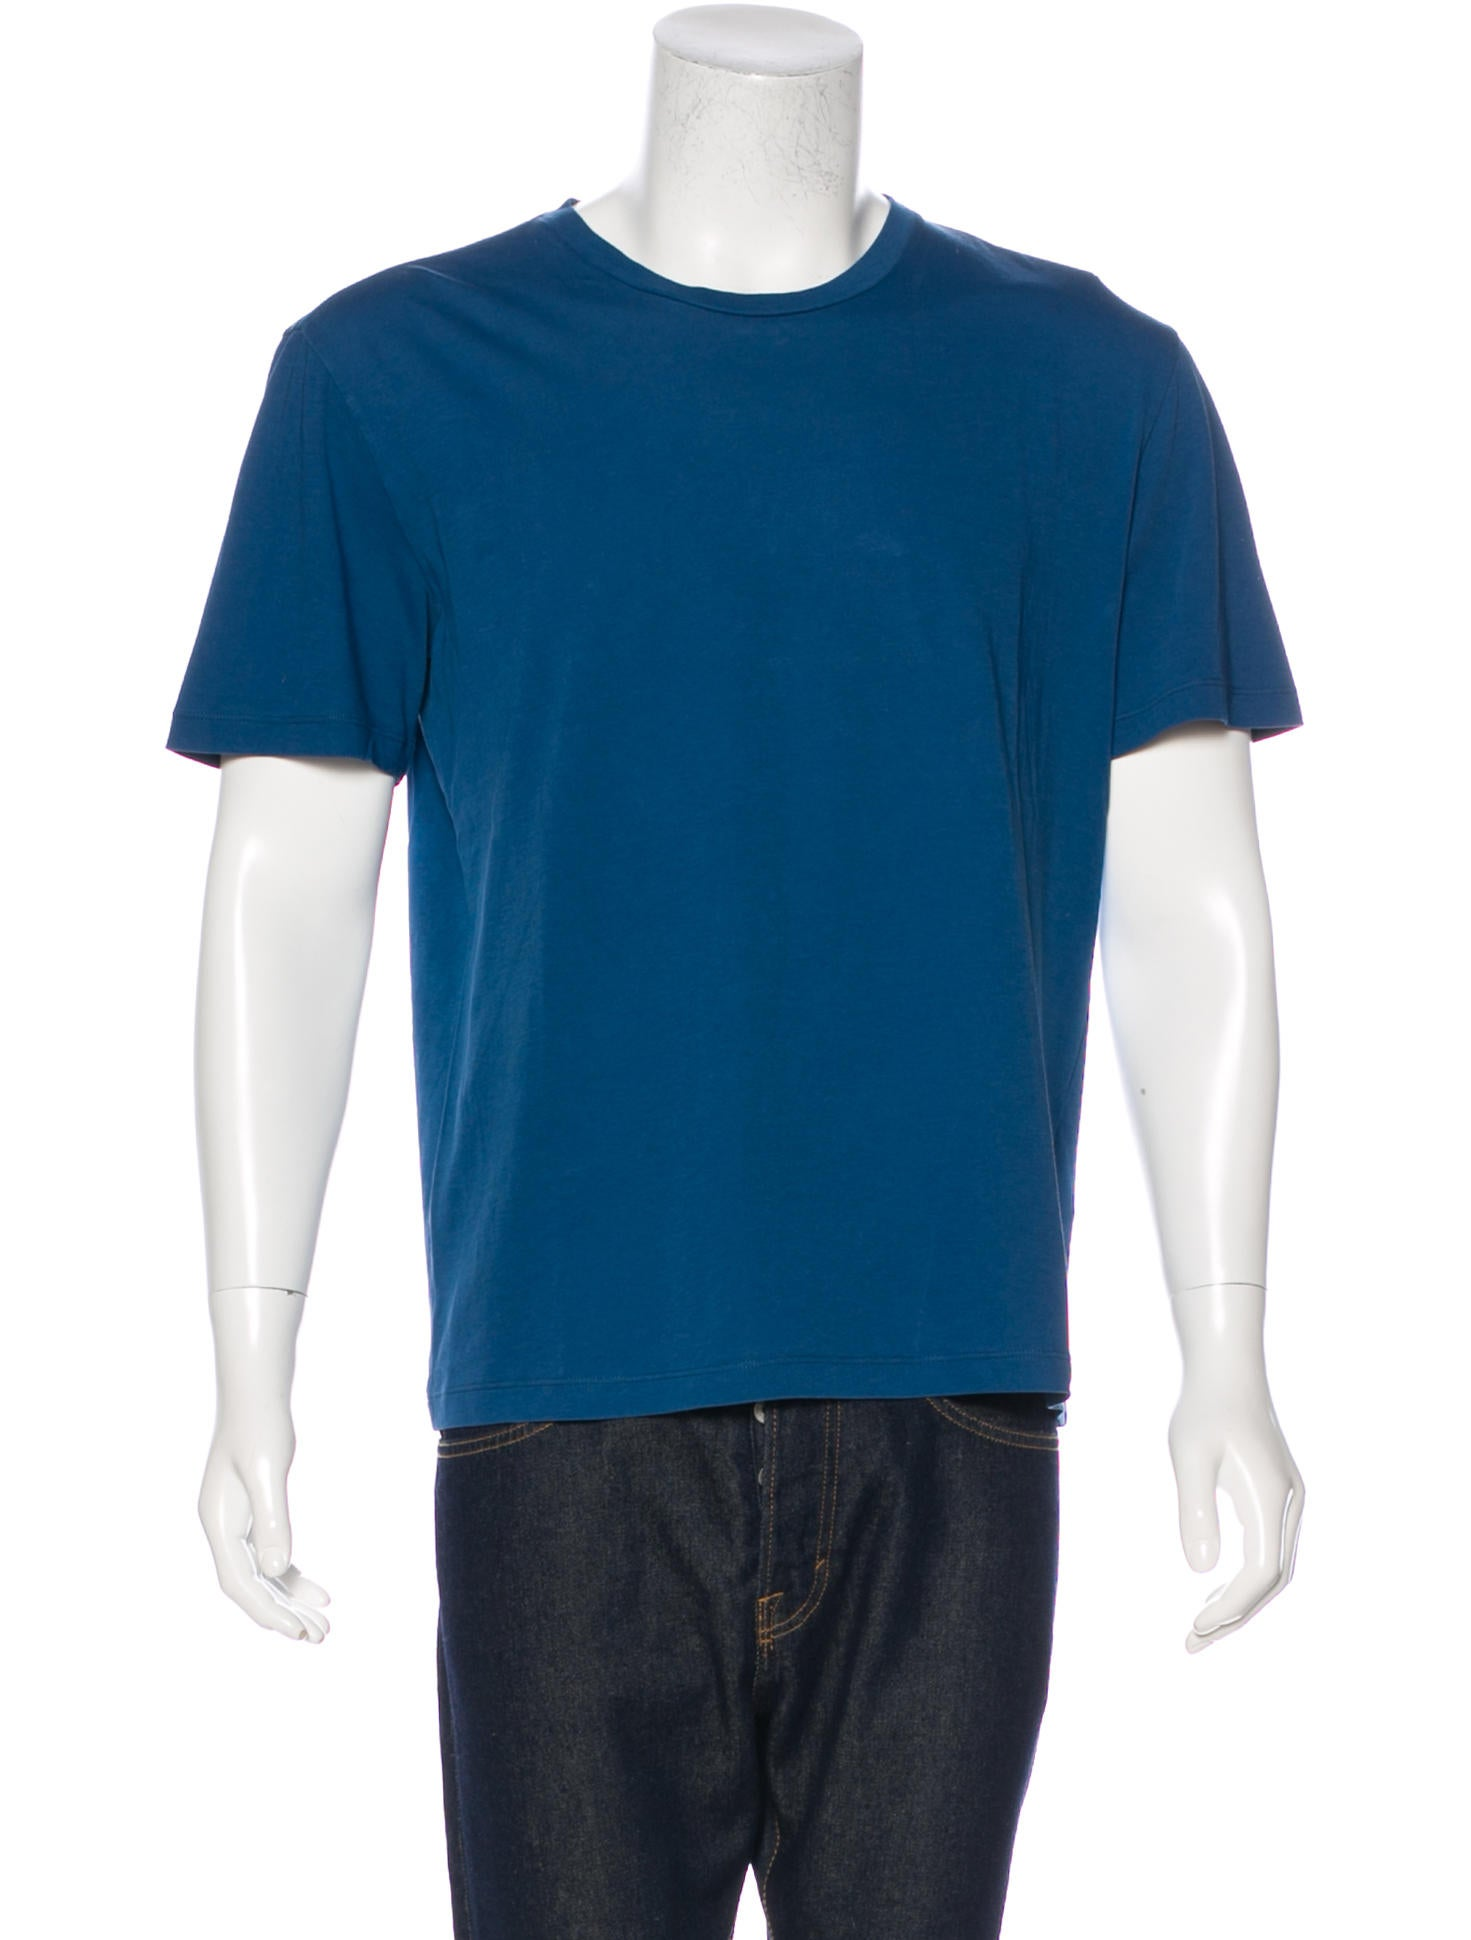 Maison Margiela Graphic Replica T Shirt w Tags Clothing